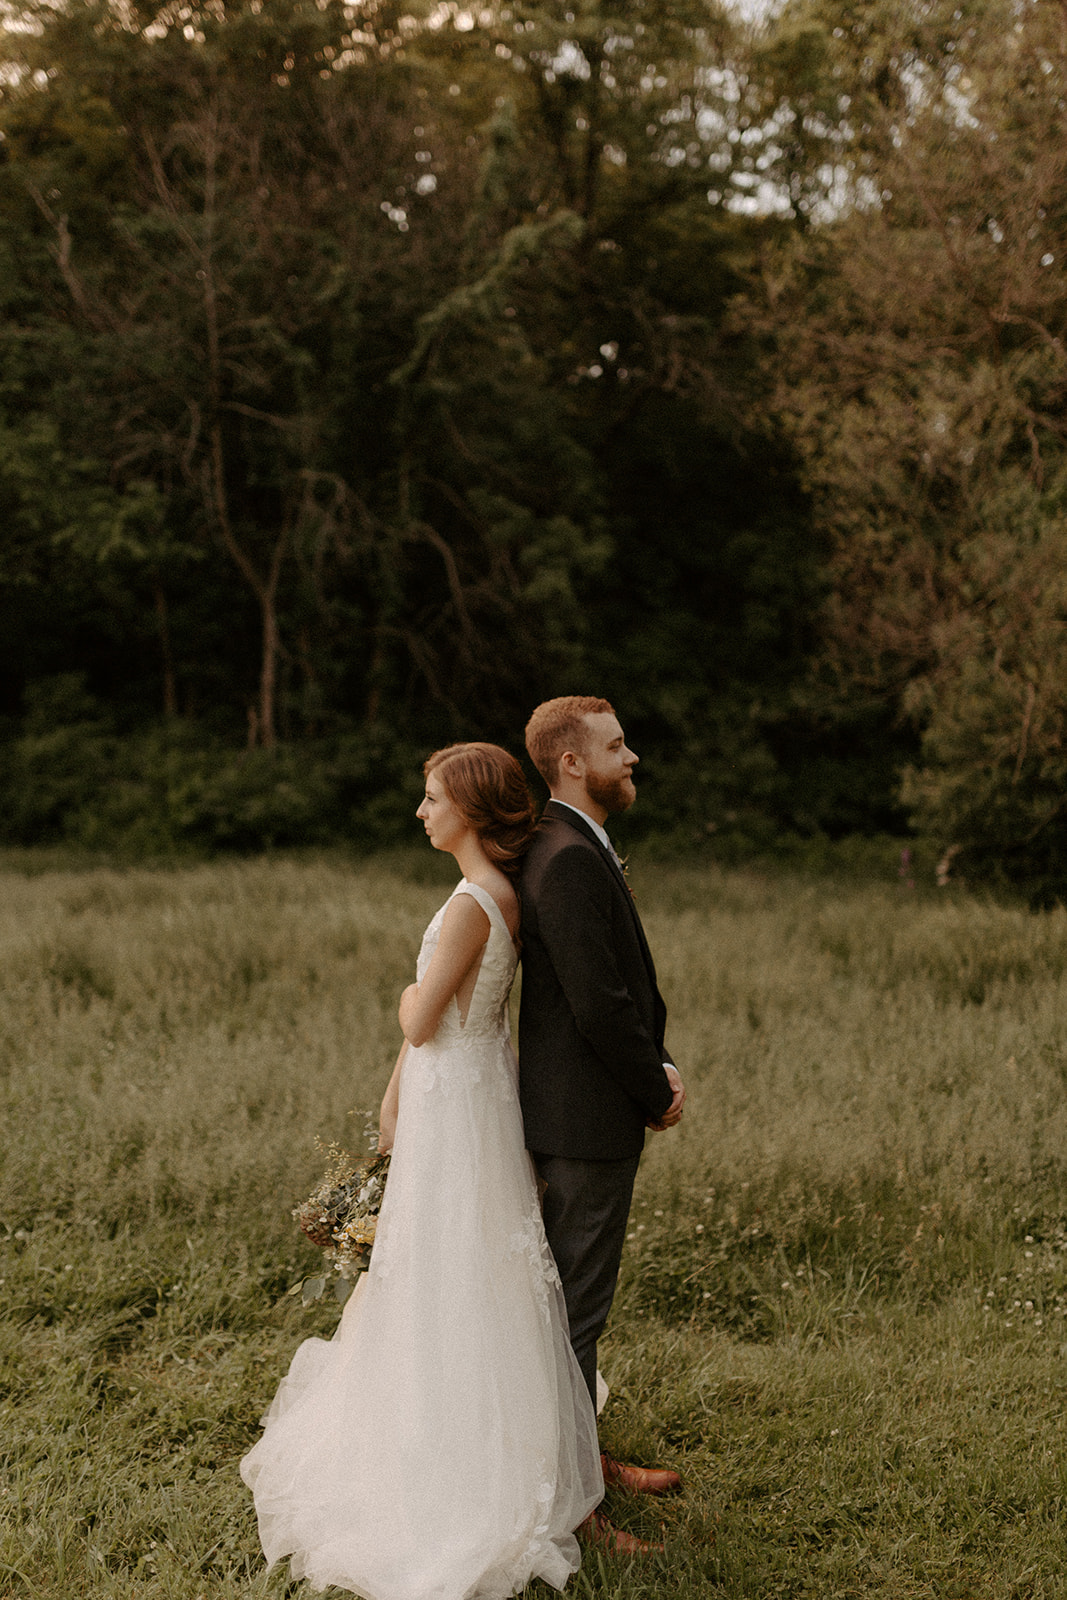 camp_wokanda_peoria_illinois_wedding_photographer_wright_photographs_bliese_0794.jpg